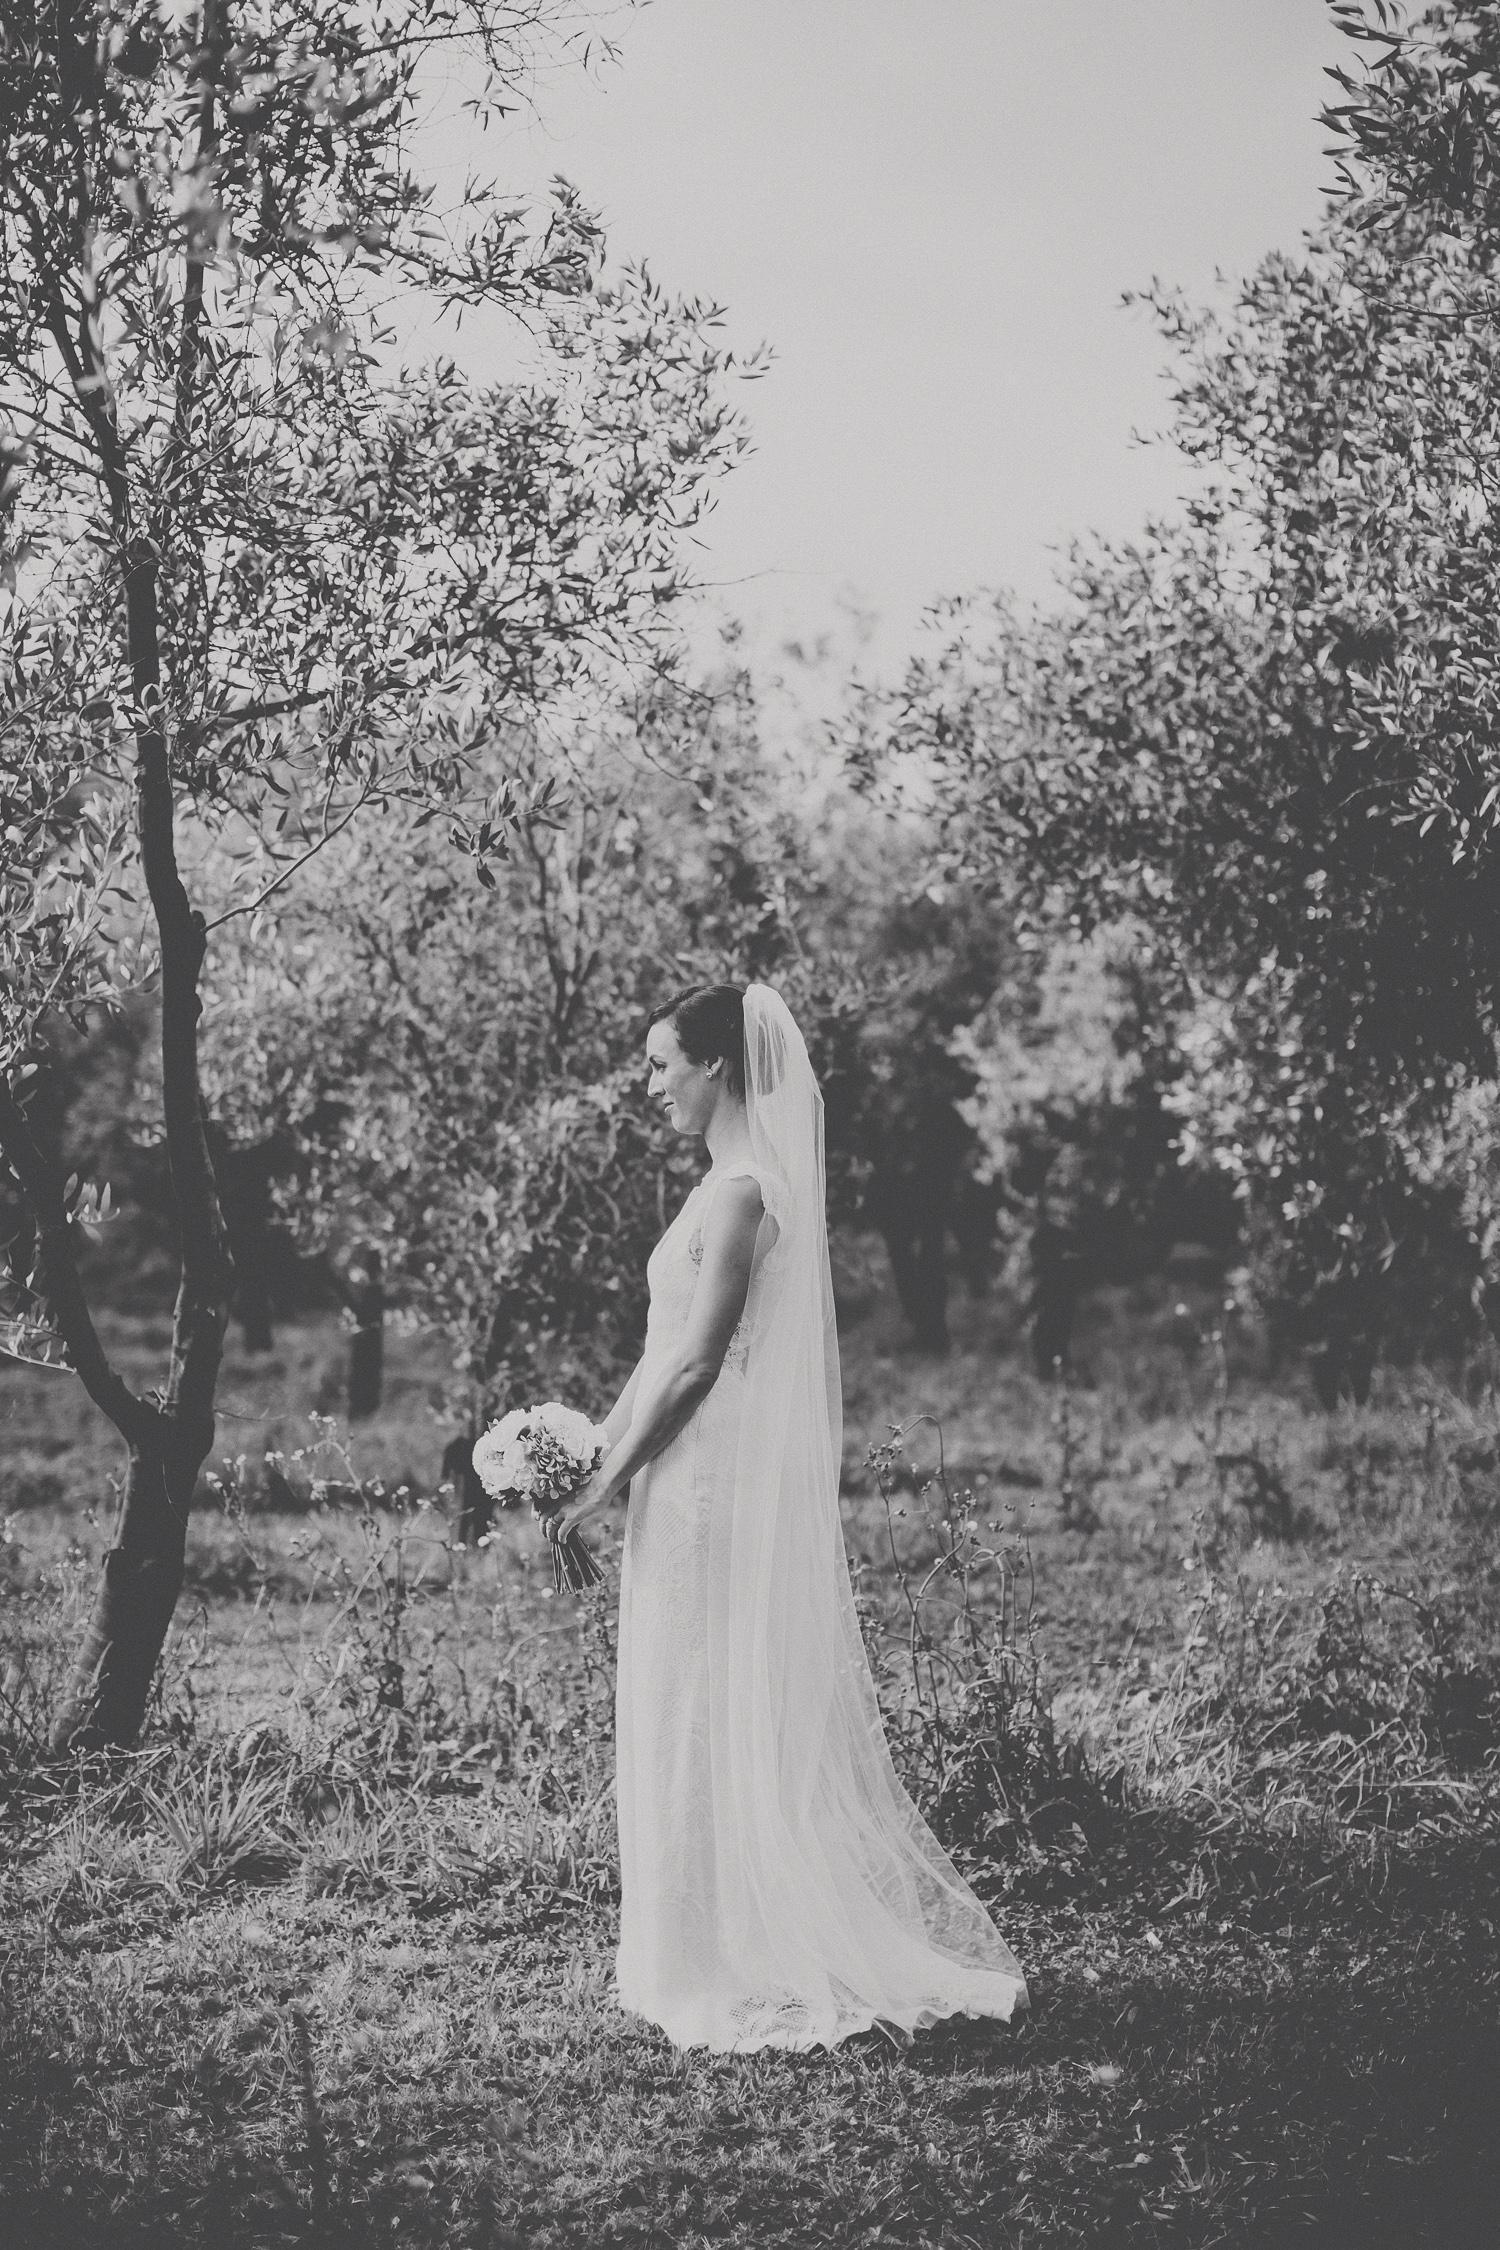 LIZ ANDREW BRACU WEDDING099.JPG